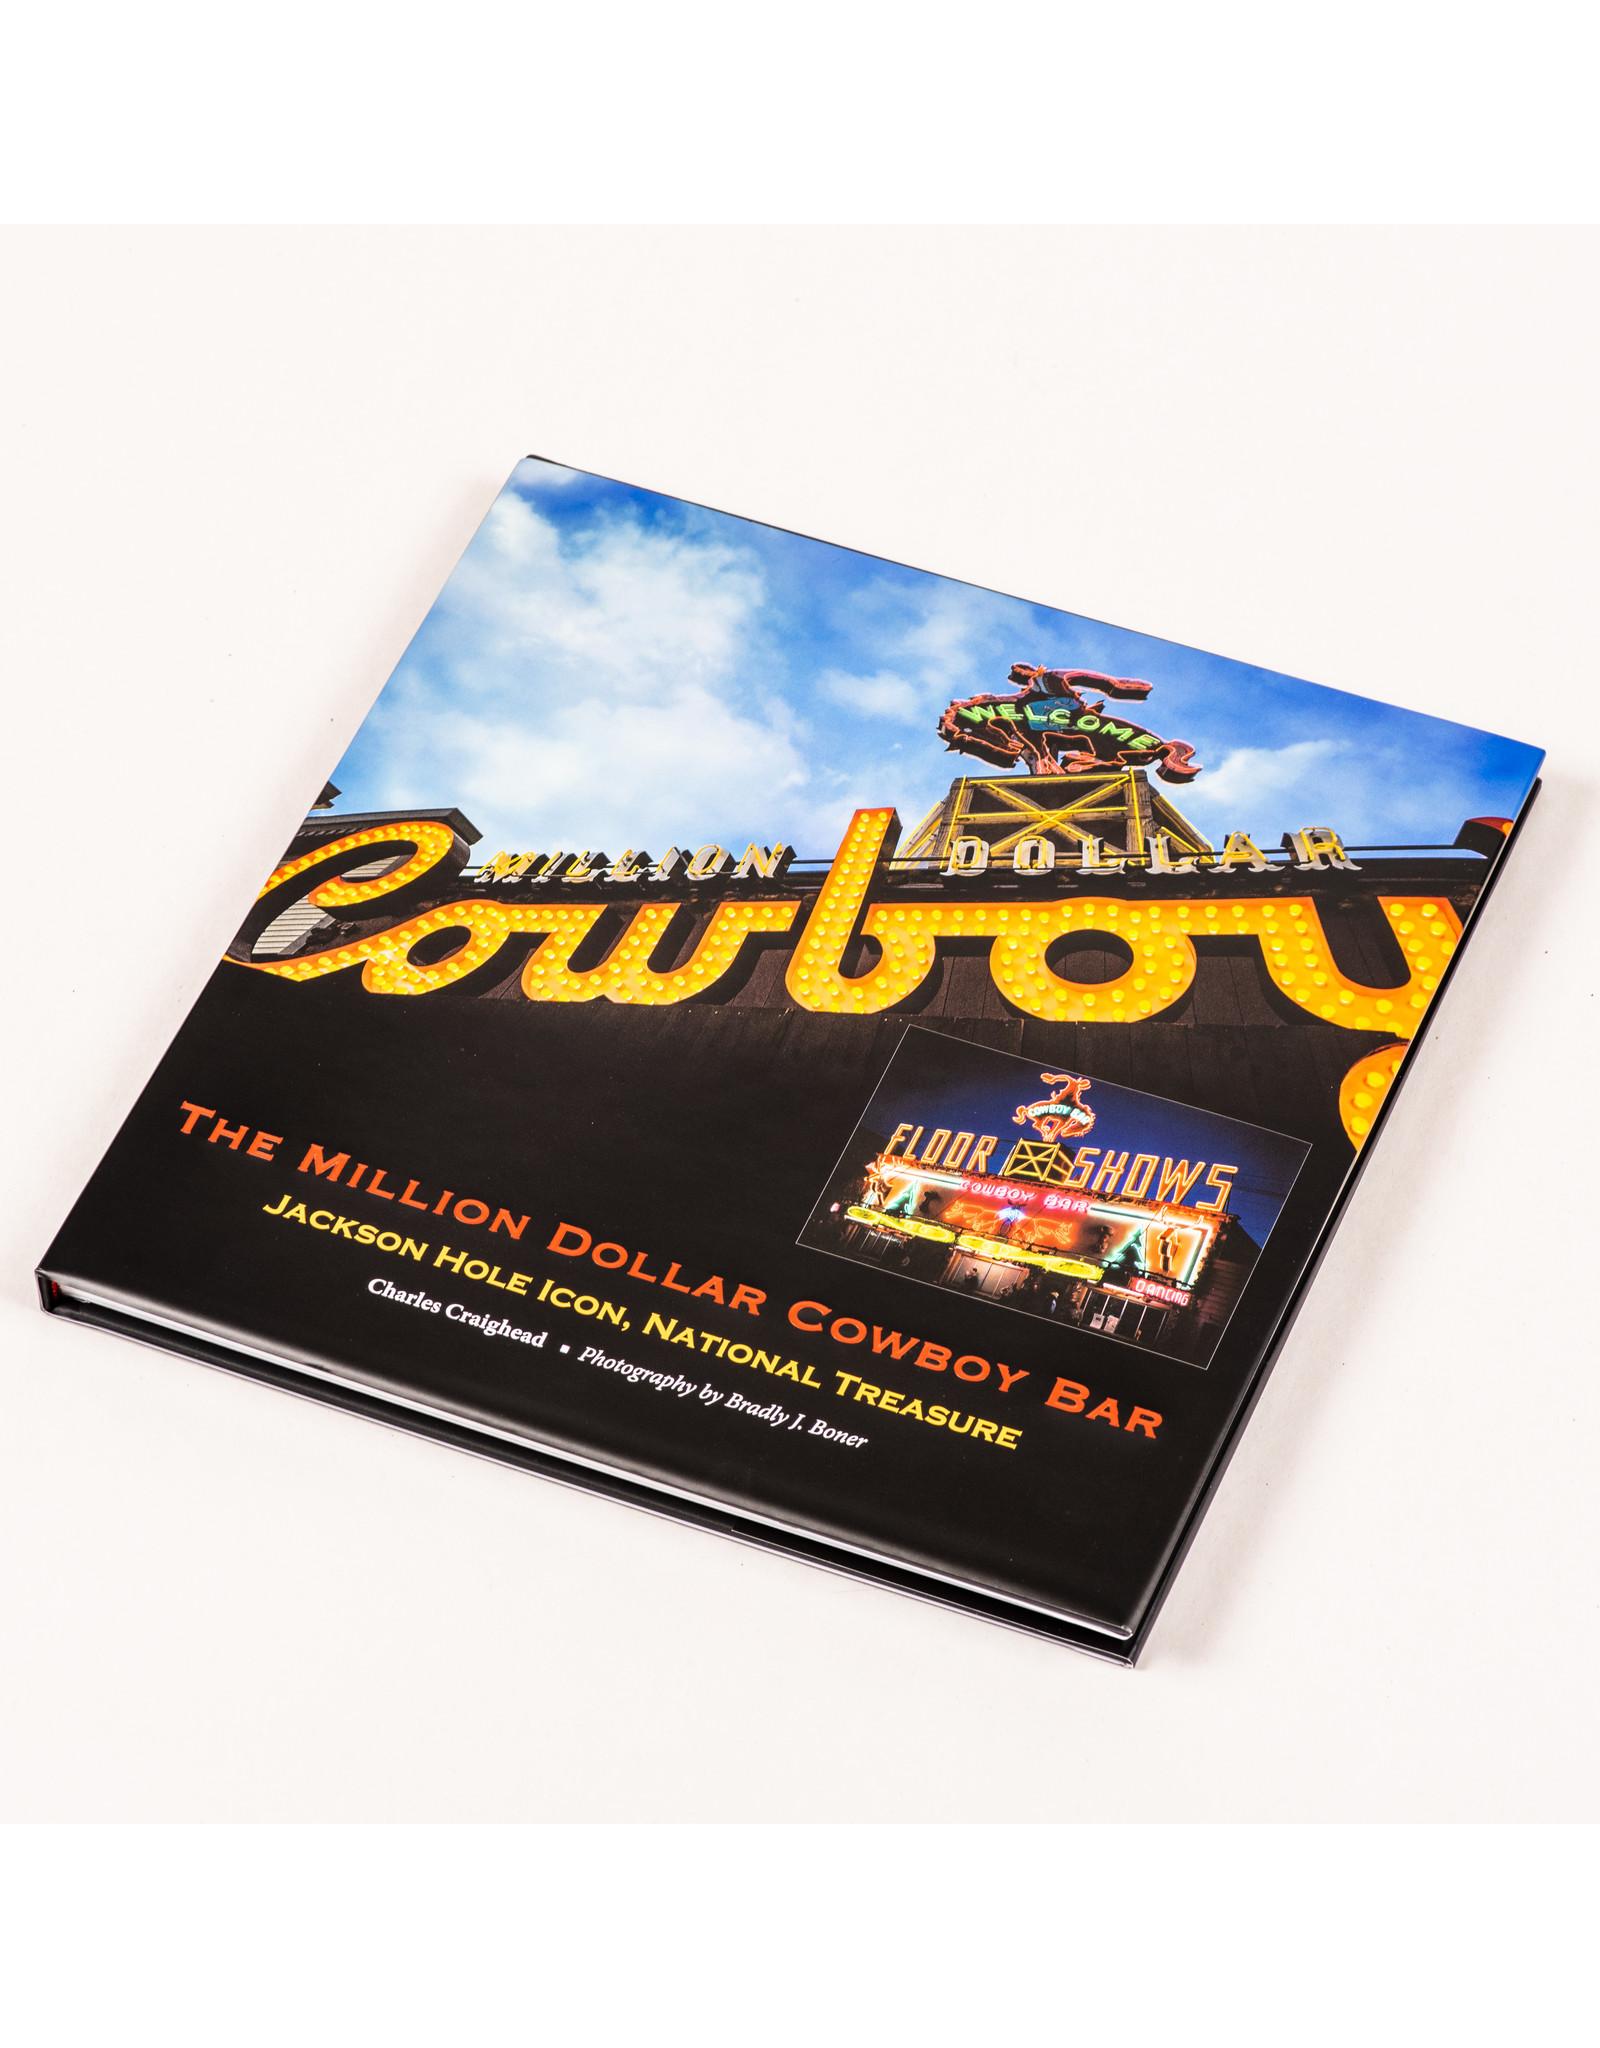 The Million Dollar Cowboy Bar Book